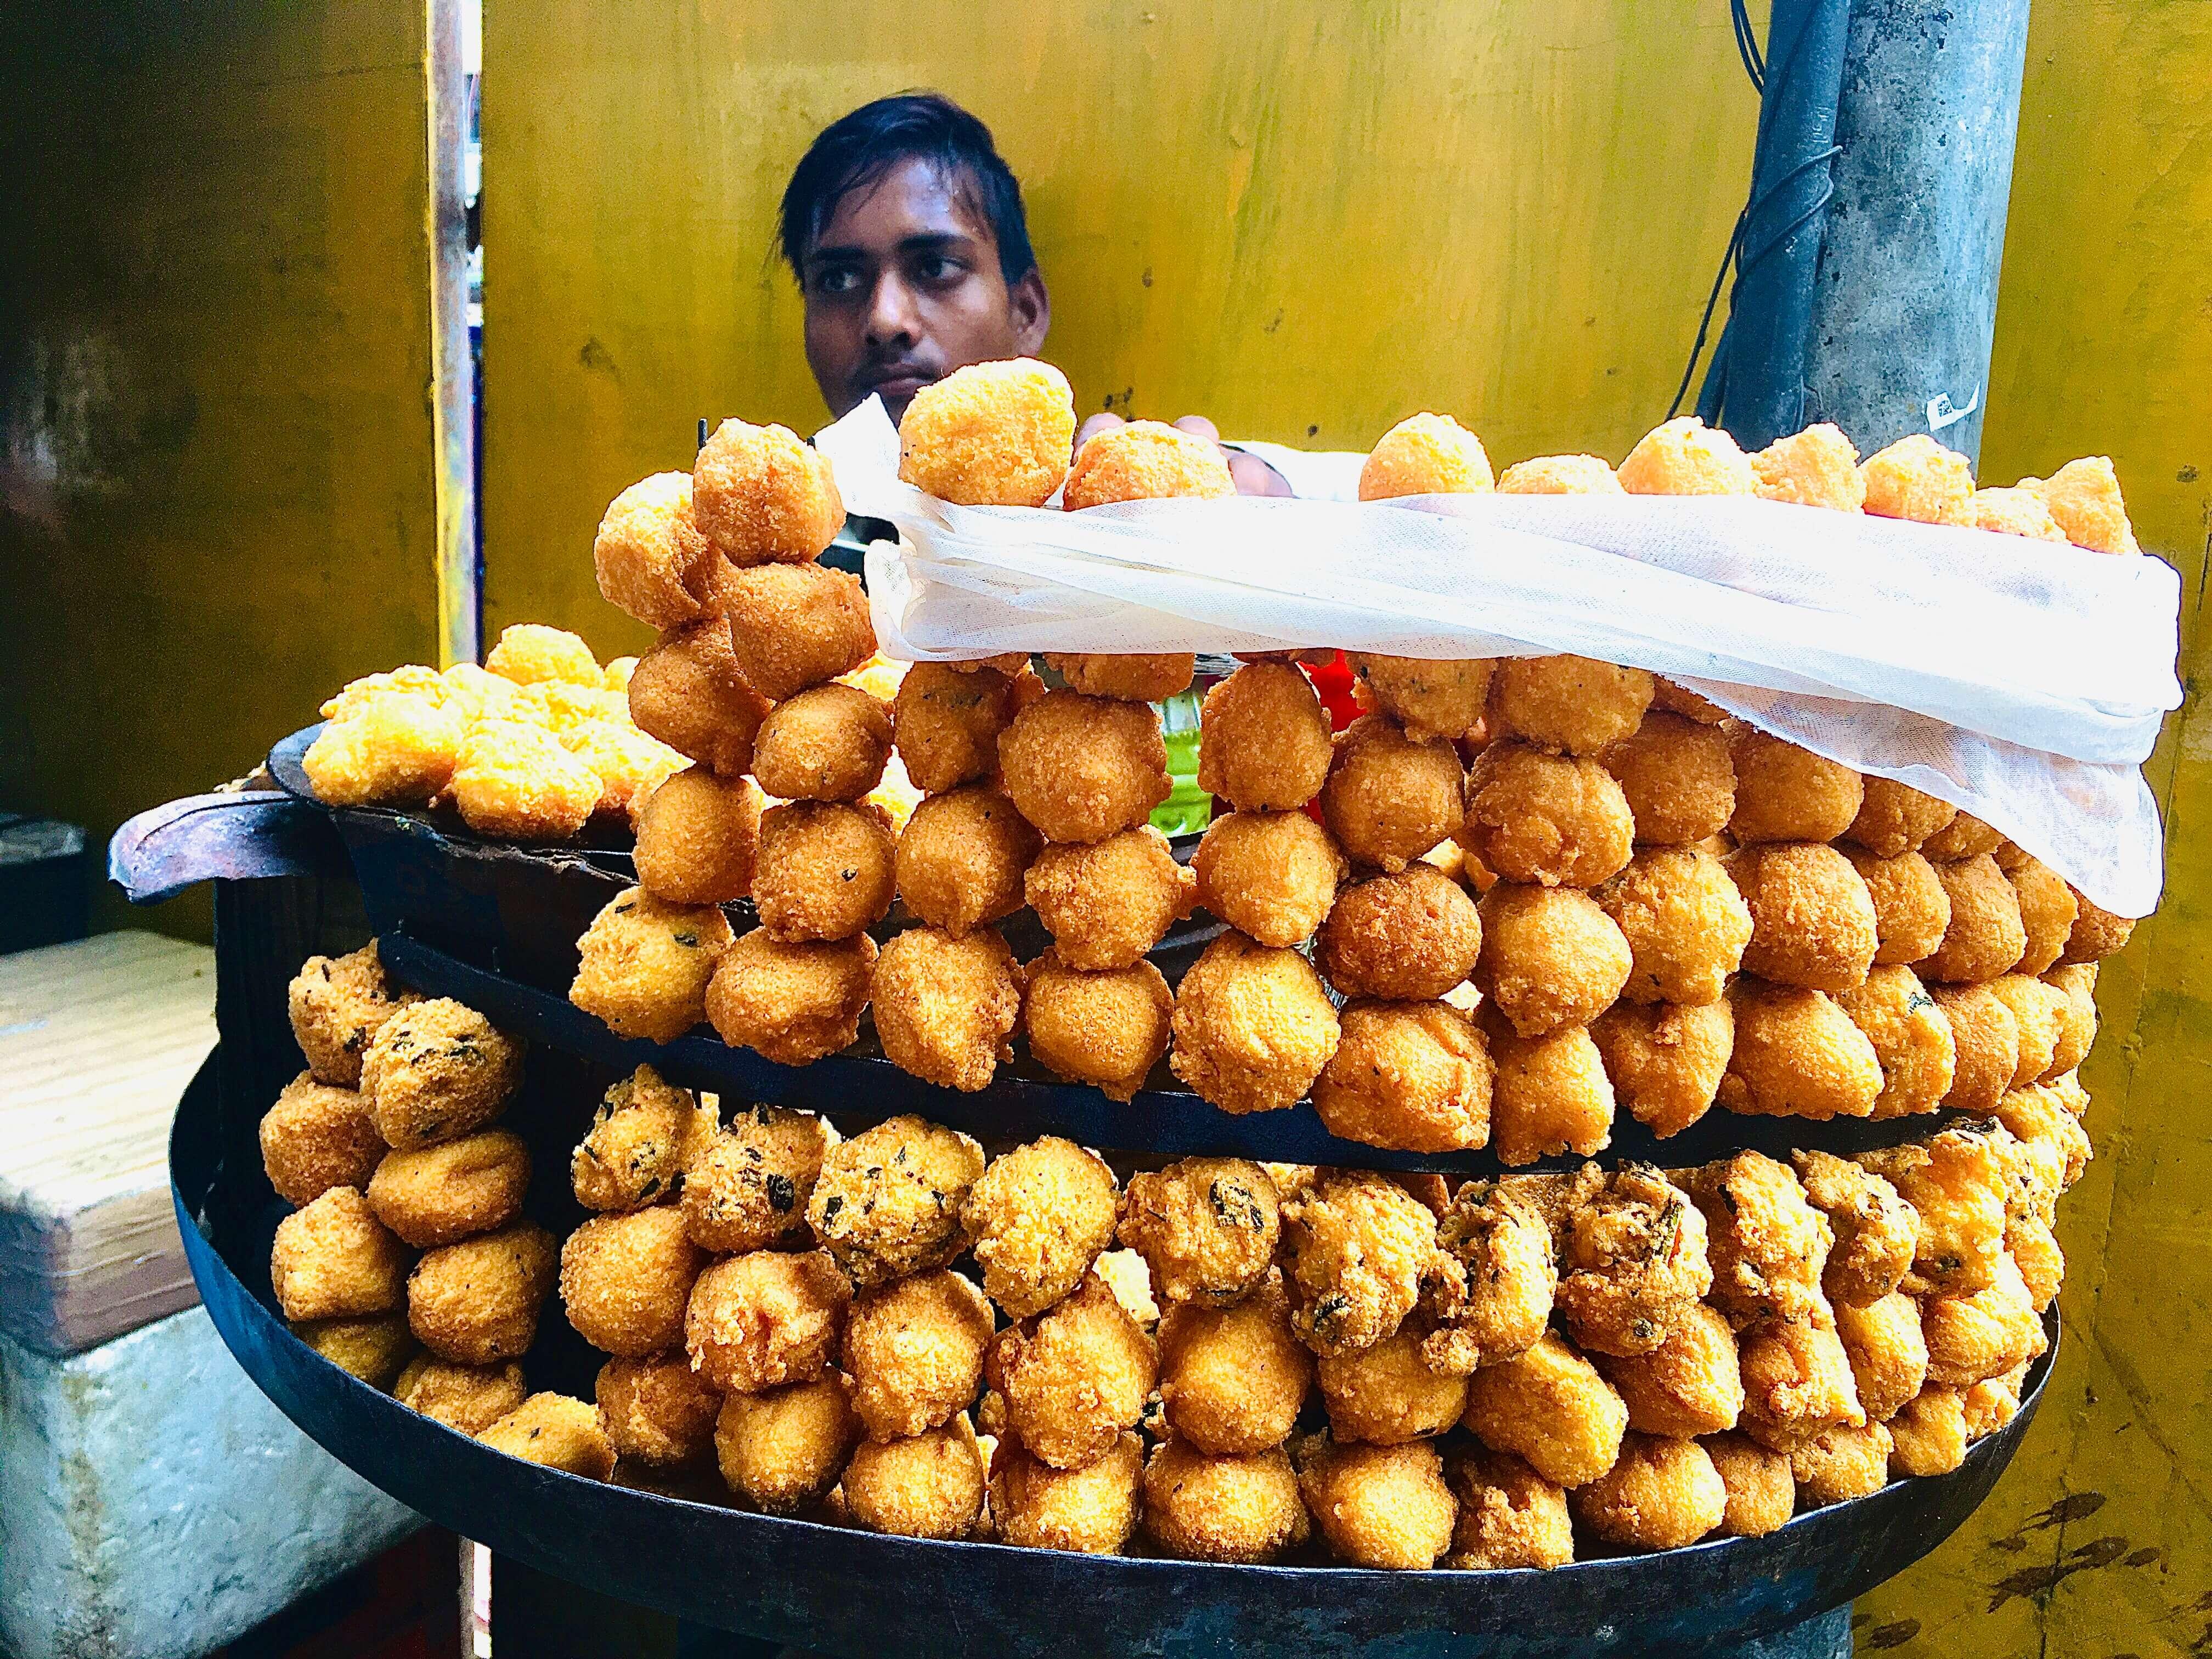 Chandni Chowk street food tour